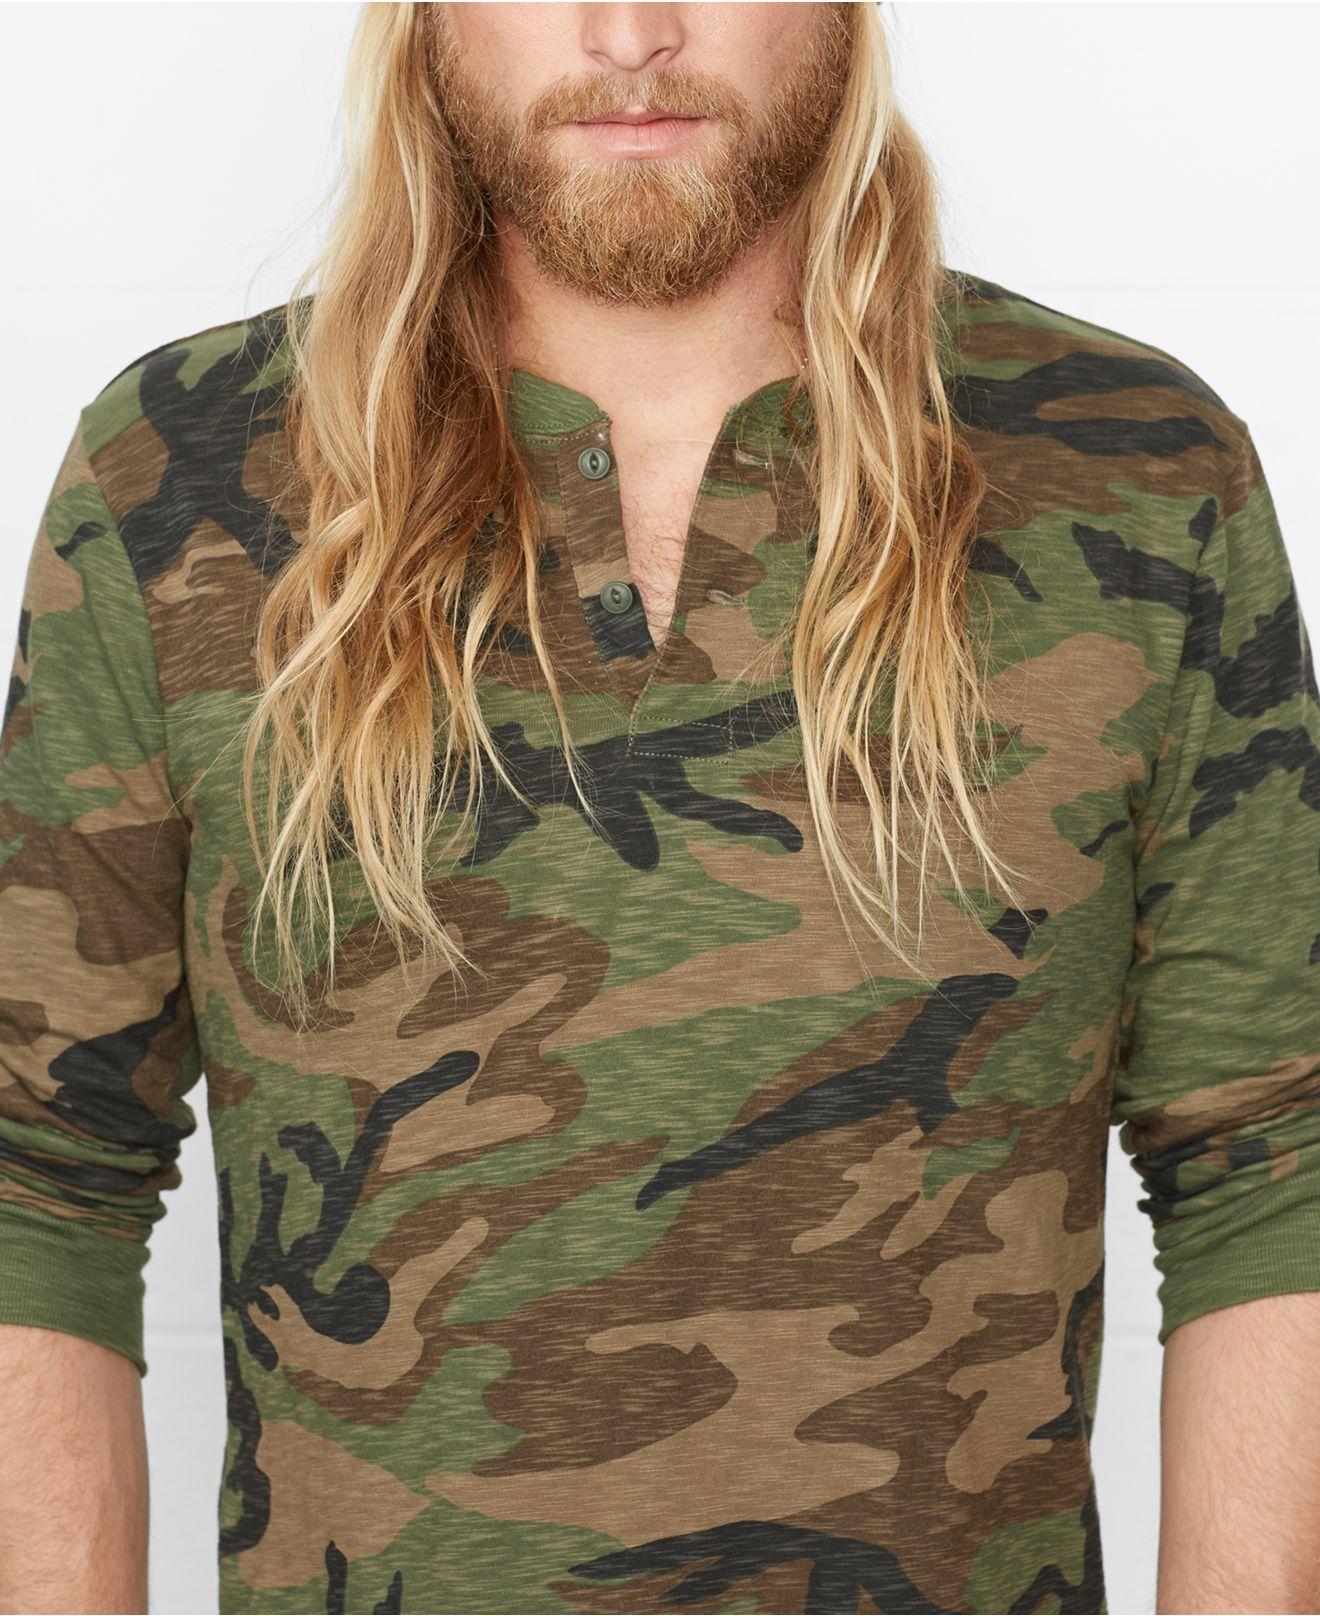 777a0e0e Denim & Supply Ralph Lauren Camo Slub-Cotton Henley Shirt in Green ...